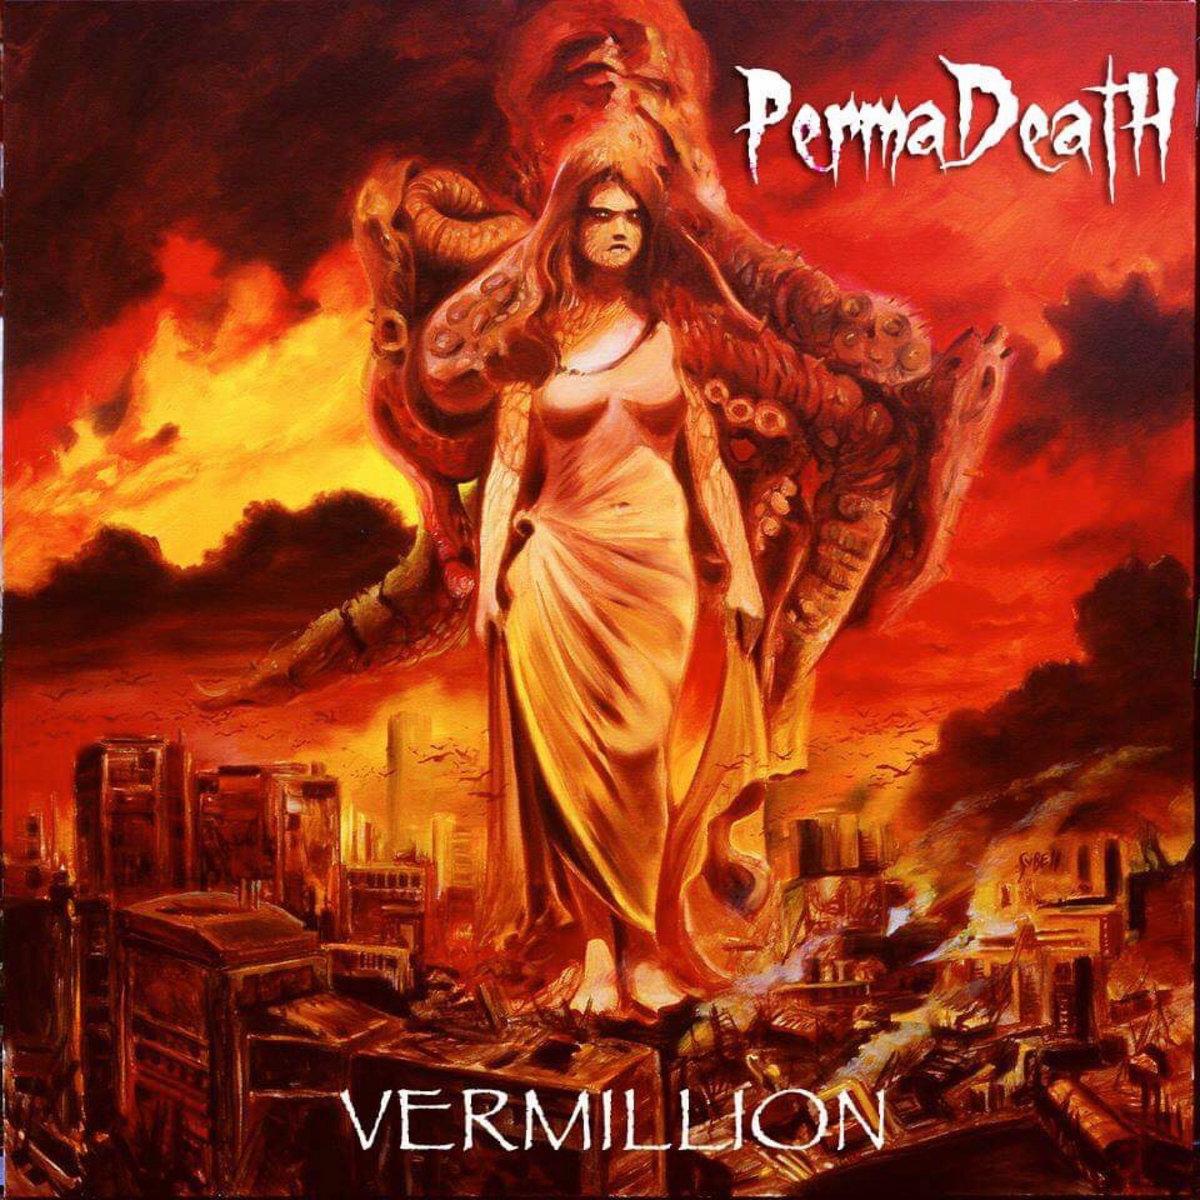 permadeath – vermillion